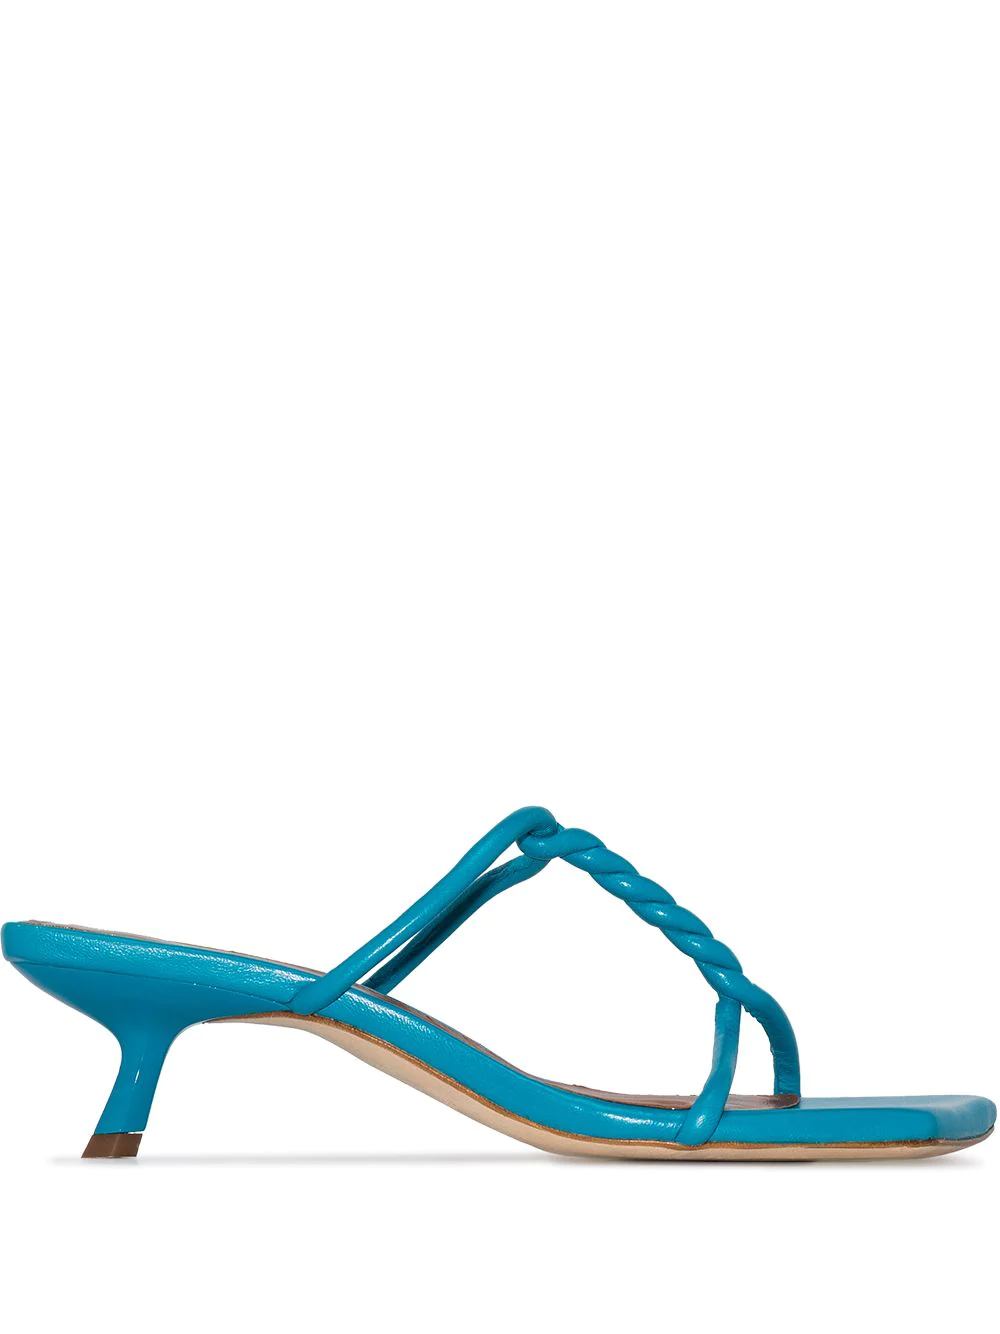 Rejina Pyo Cleo 30mm Sandals 1055лв